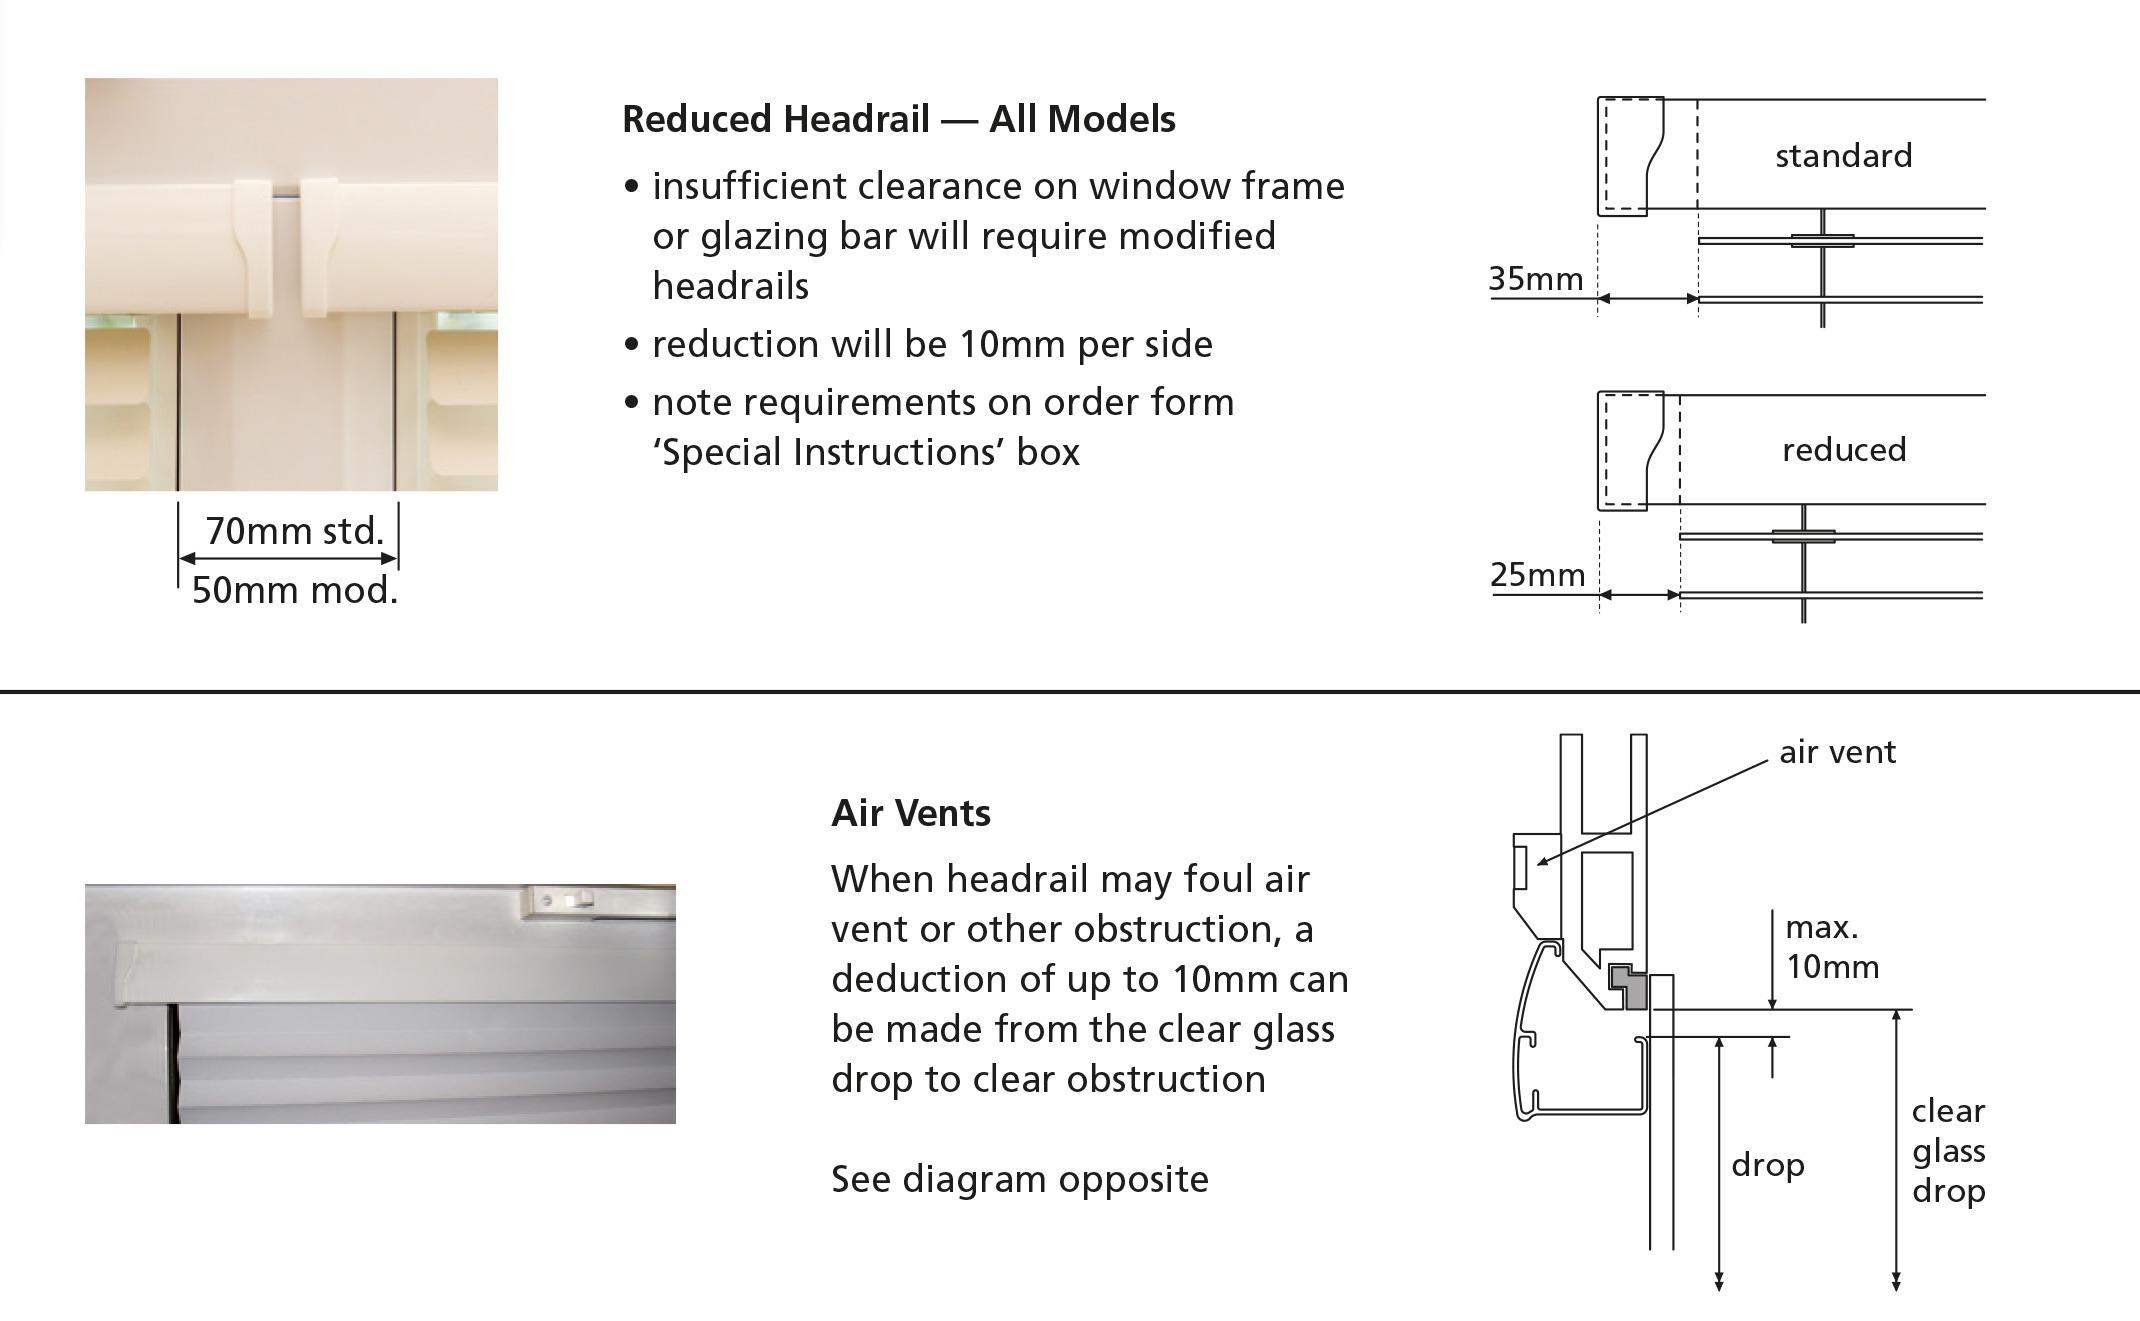 Intu headrail clearance information